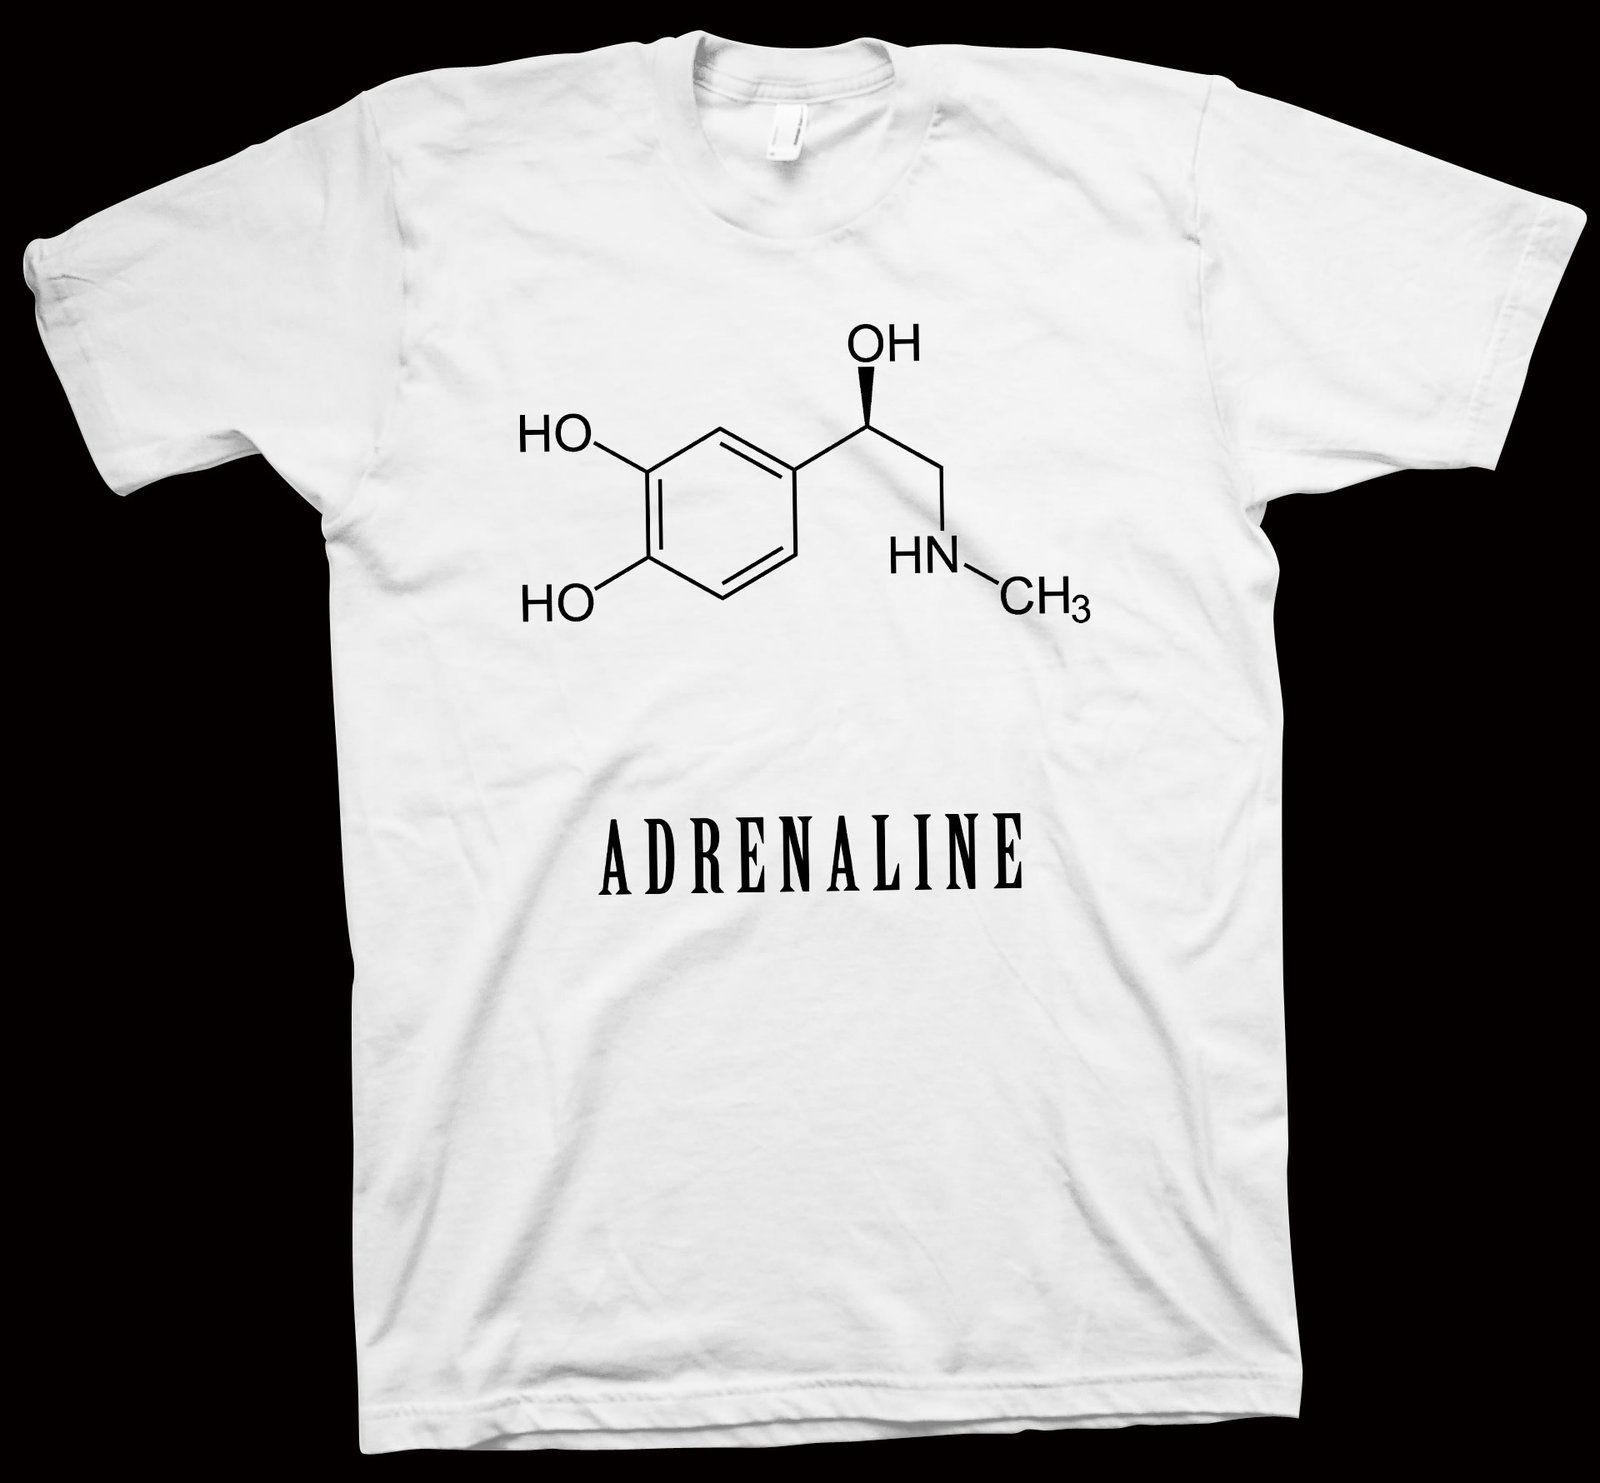 5436bdde3 Adrenaline T-Shirt , Chemistry , Formula , Structure , Science , Tee ,  C9H13NO3 - T-Shirts